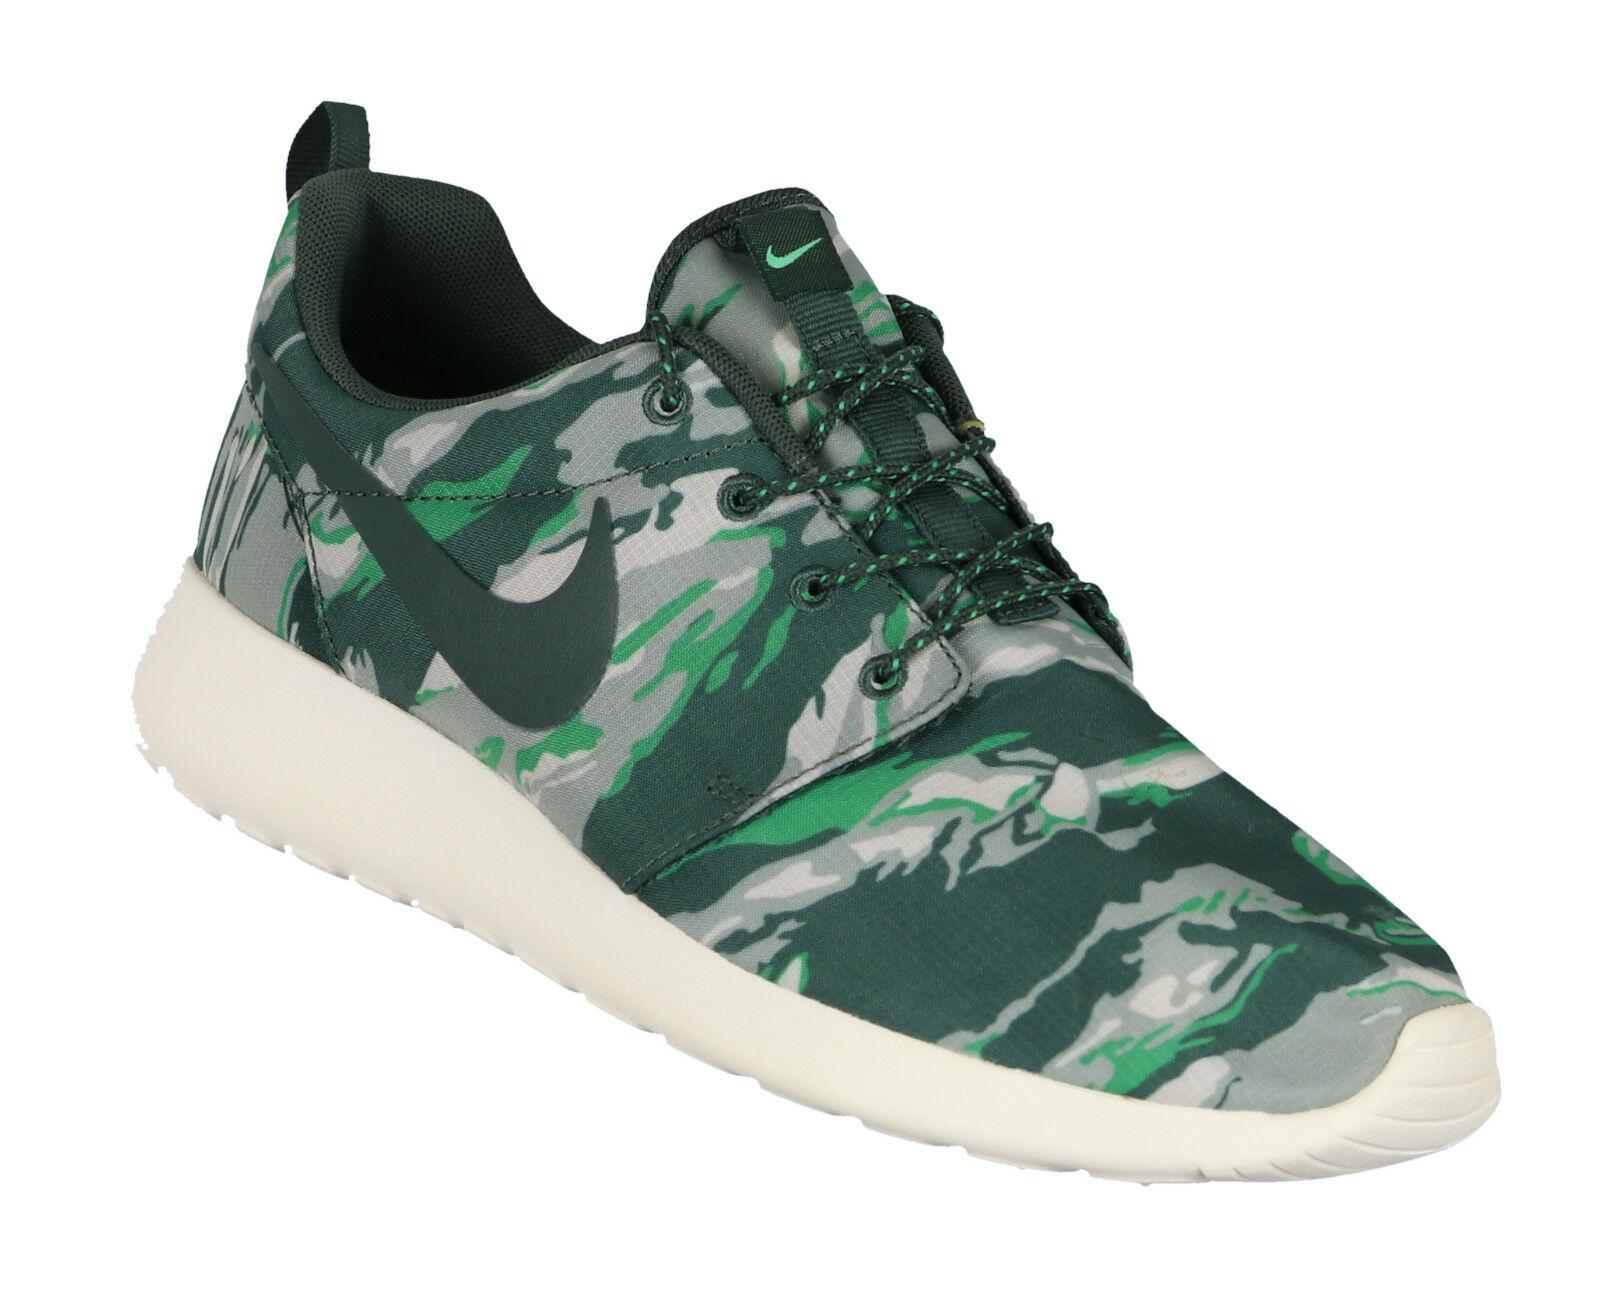 Nike ROSHERUN Rayas GPX Vintage Verde Tigre Rayas ROSHERUN Premium roshe Gamma 79f24d